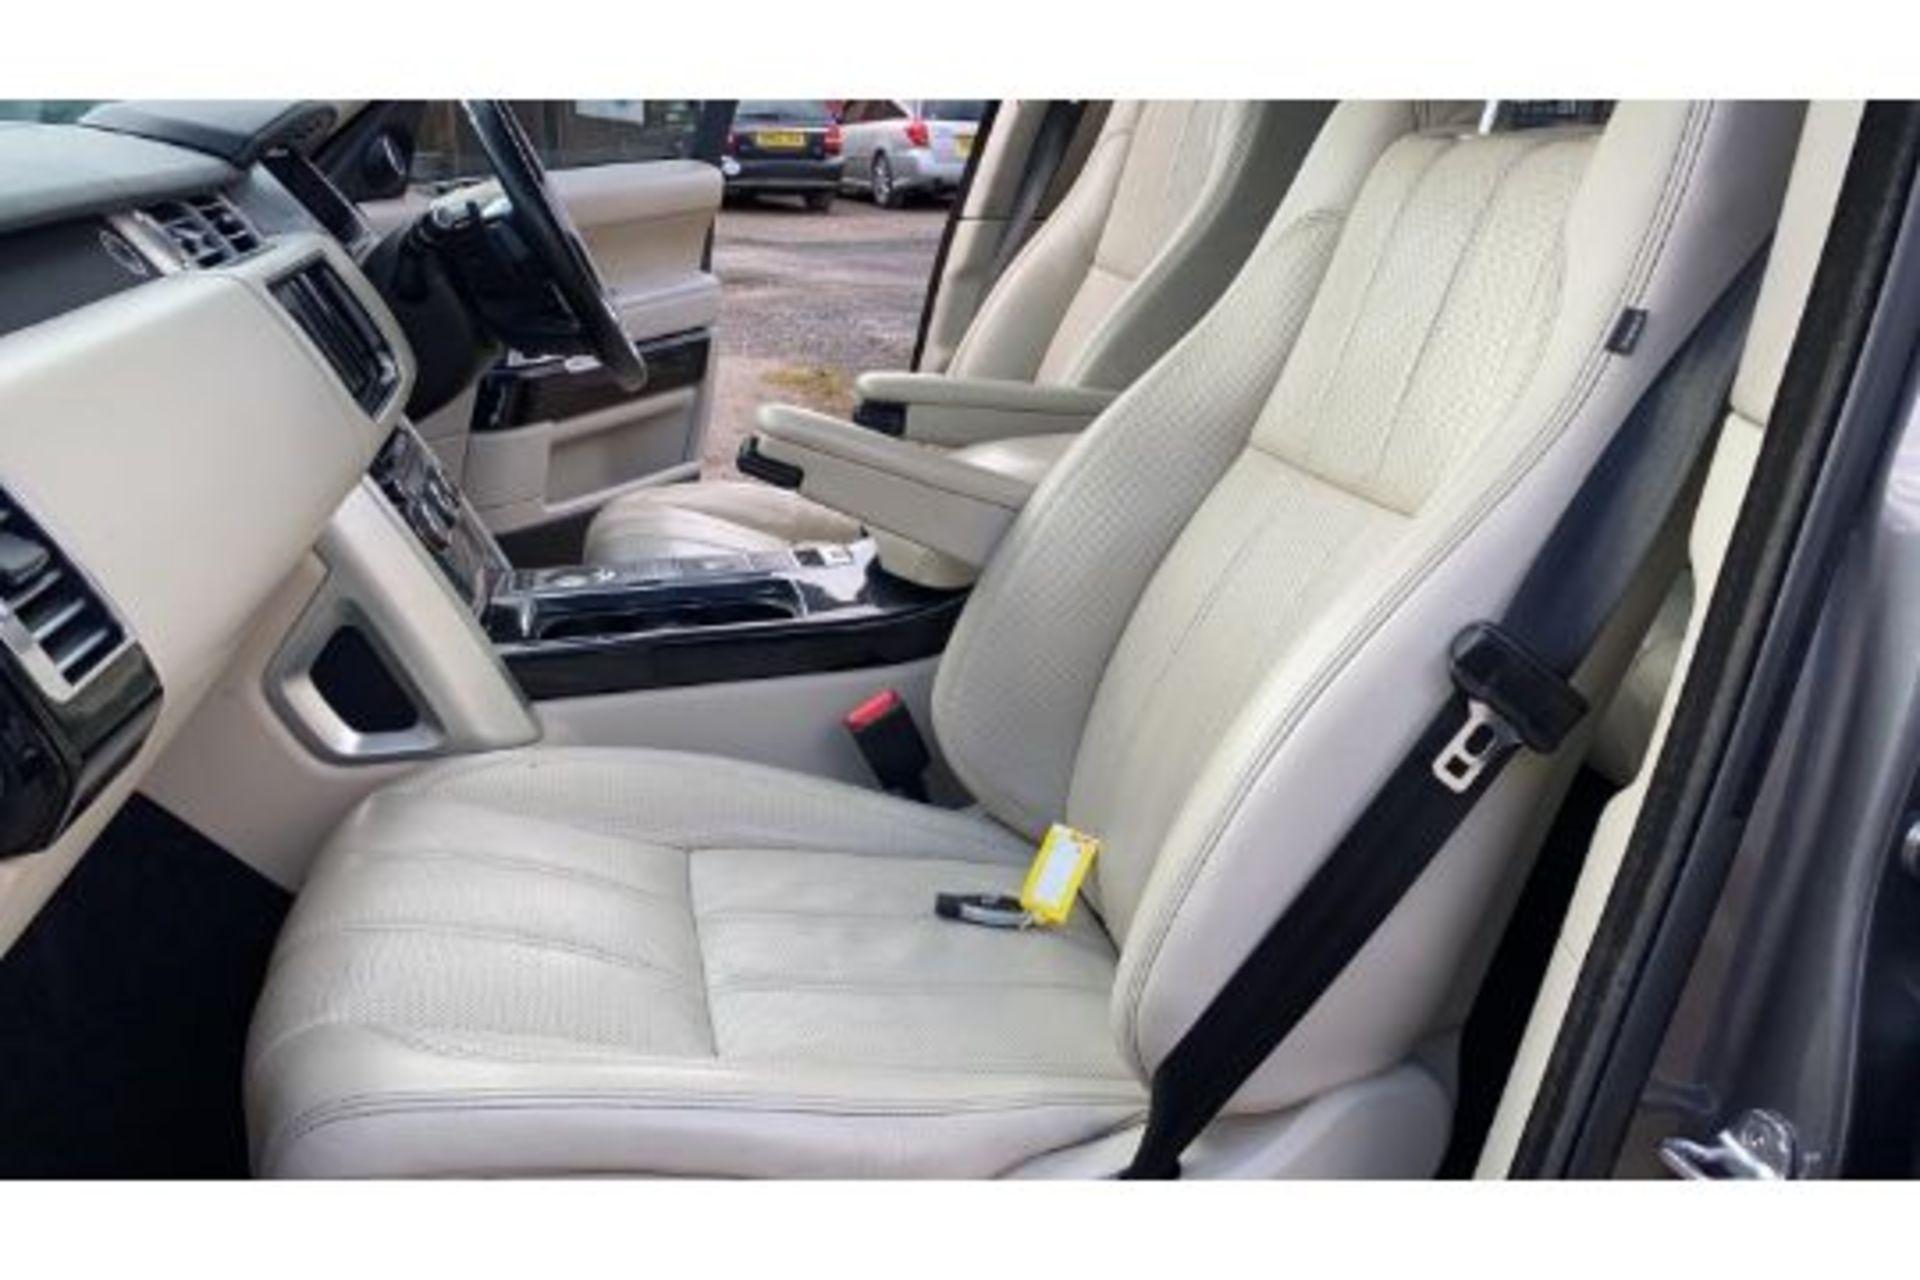 Range Rover Vogue 3.0 TDV6 SE Auto - Black Pack - NEW SHAPE - FULLY LOADED - Pan Roof - Image 13 of 30